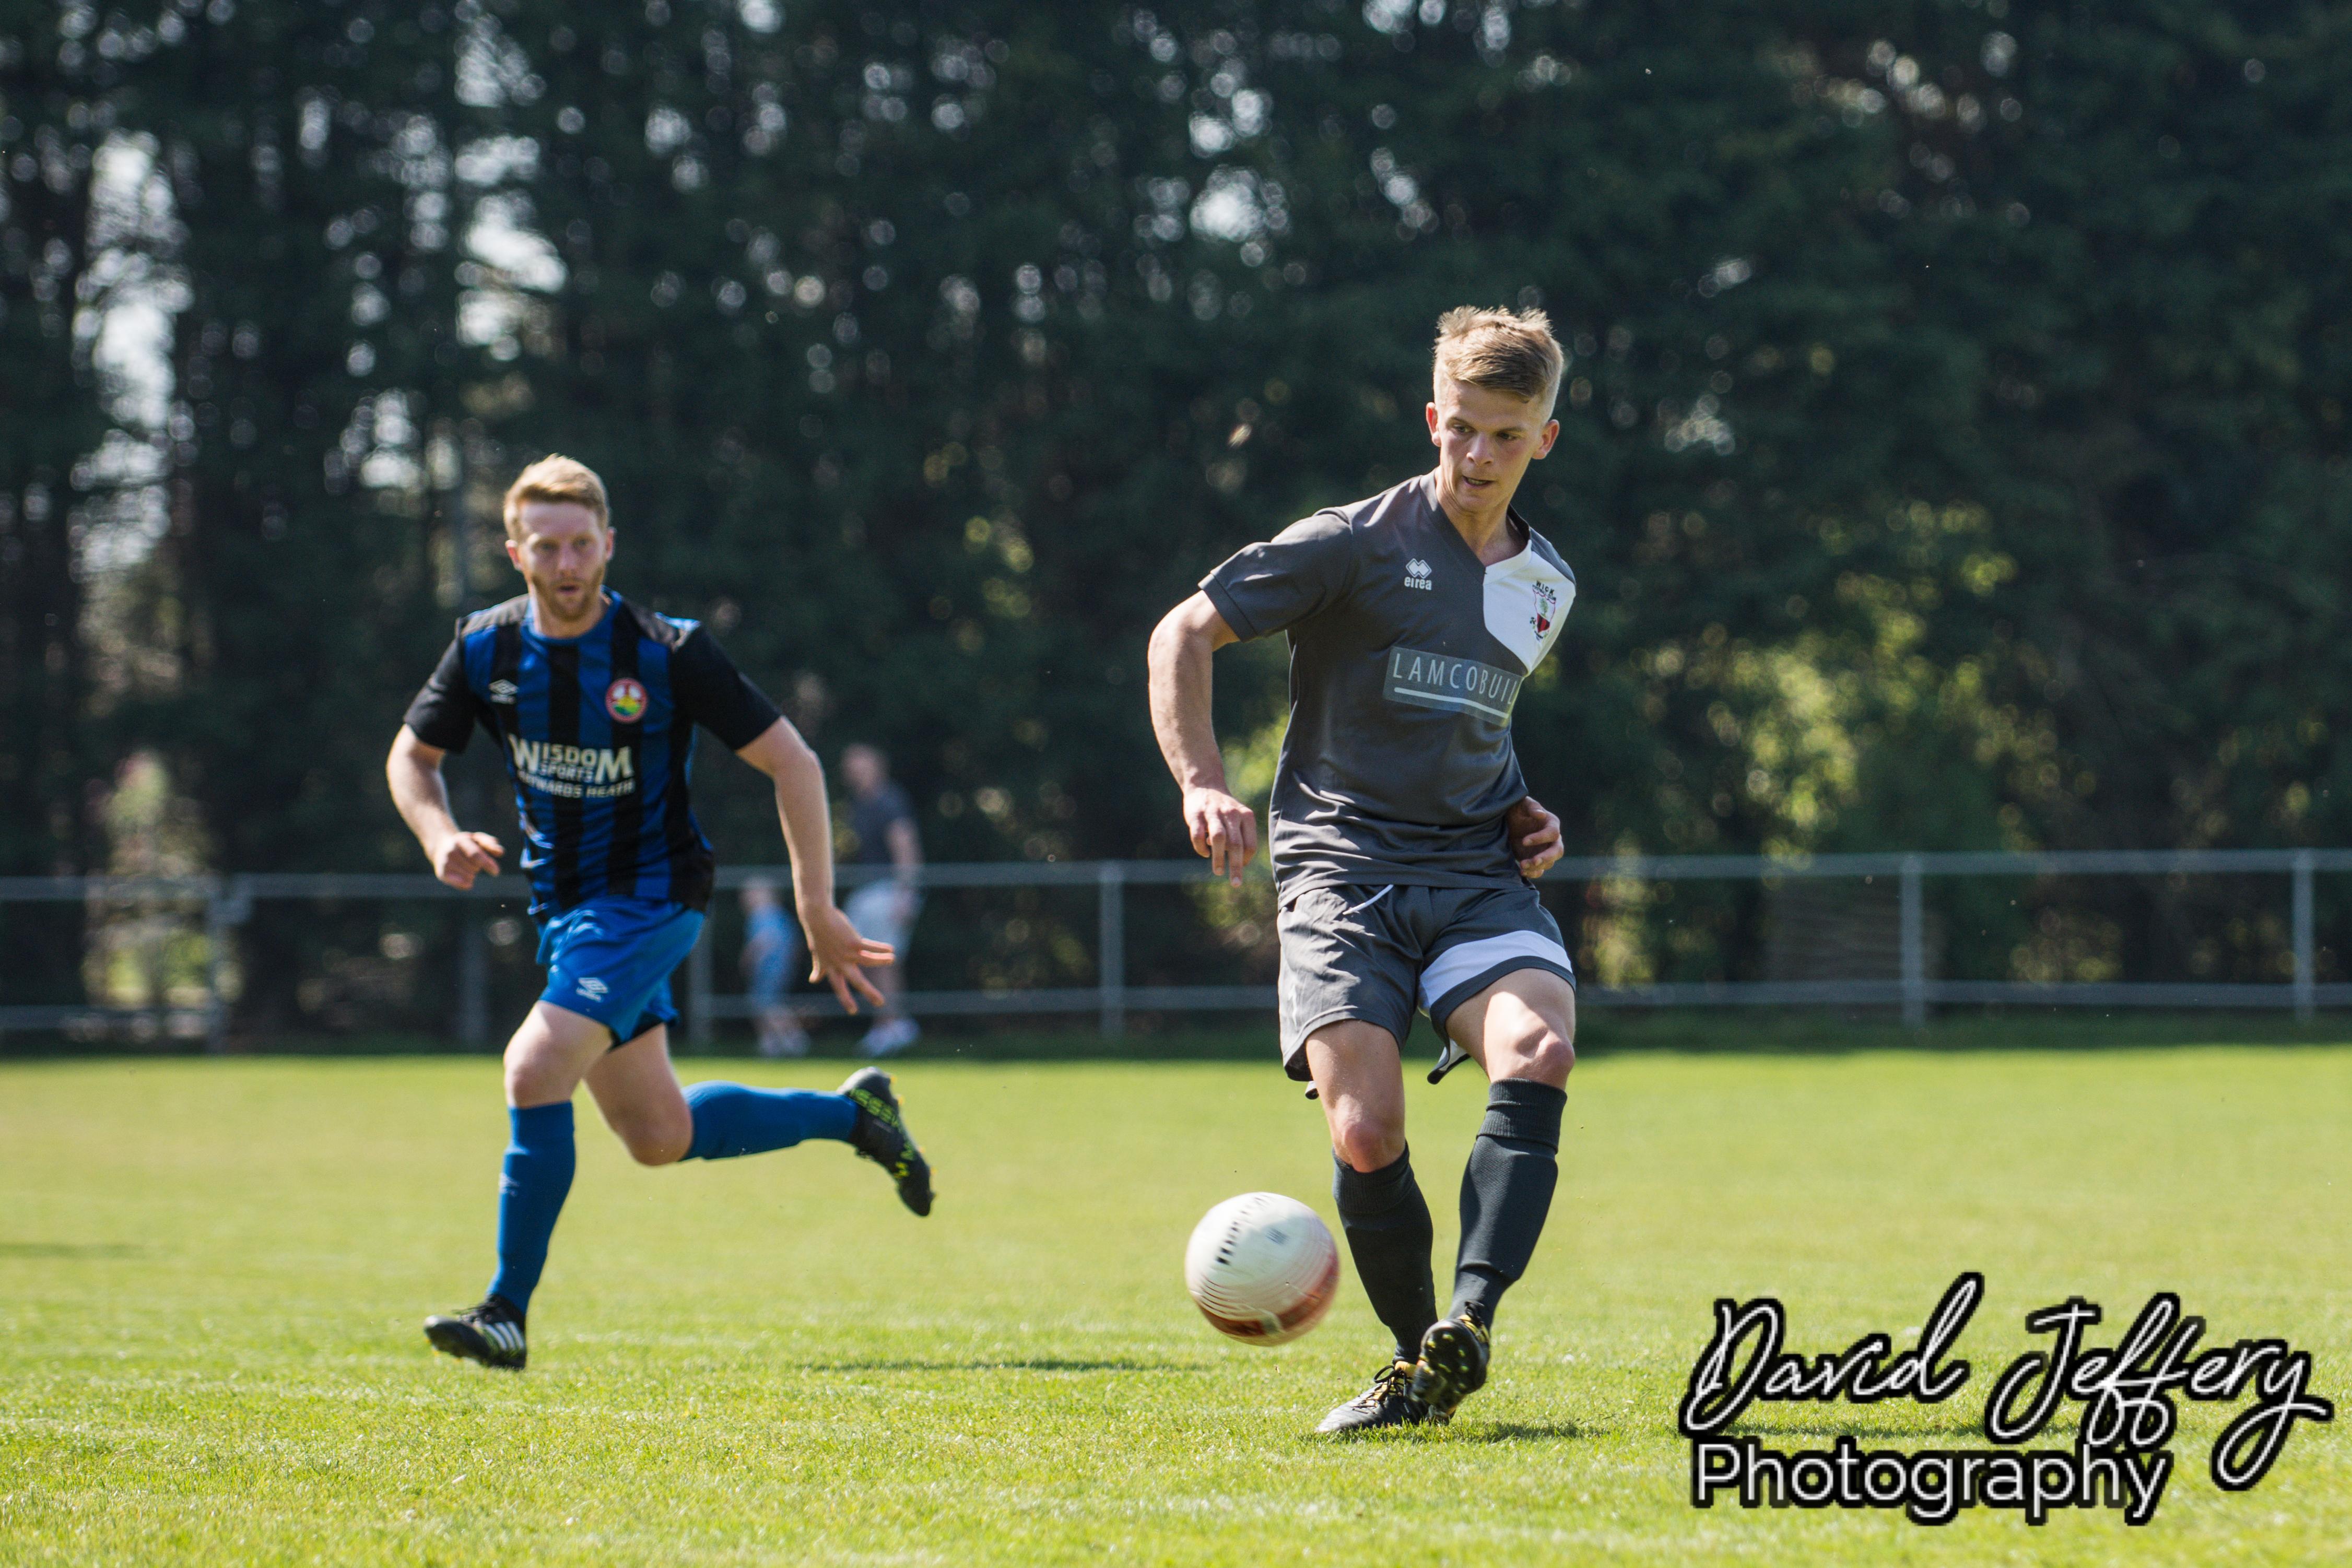 047 Steyn vs Wick, Div1 Cup Final DAVID_